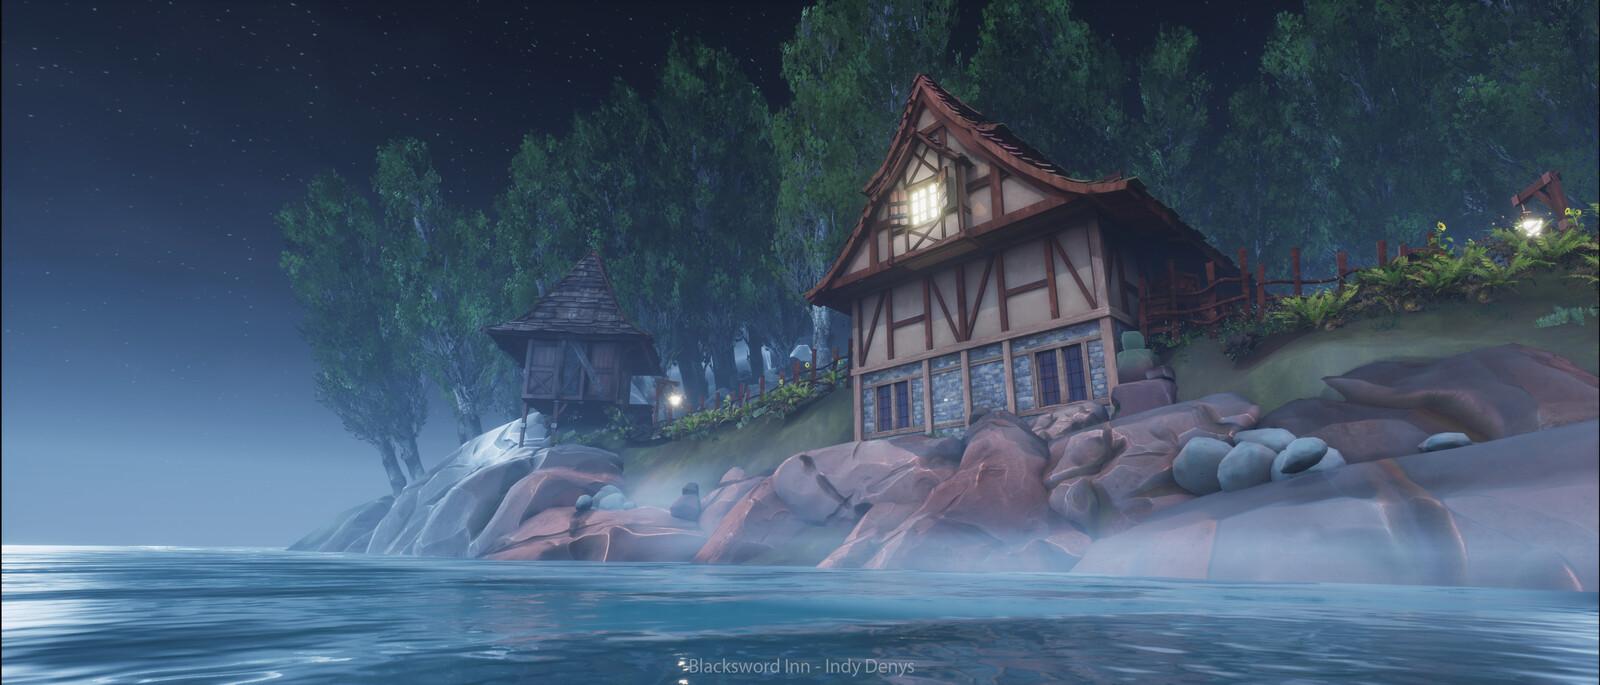 Blacksword inn